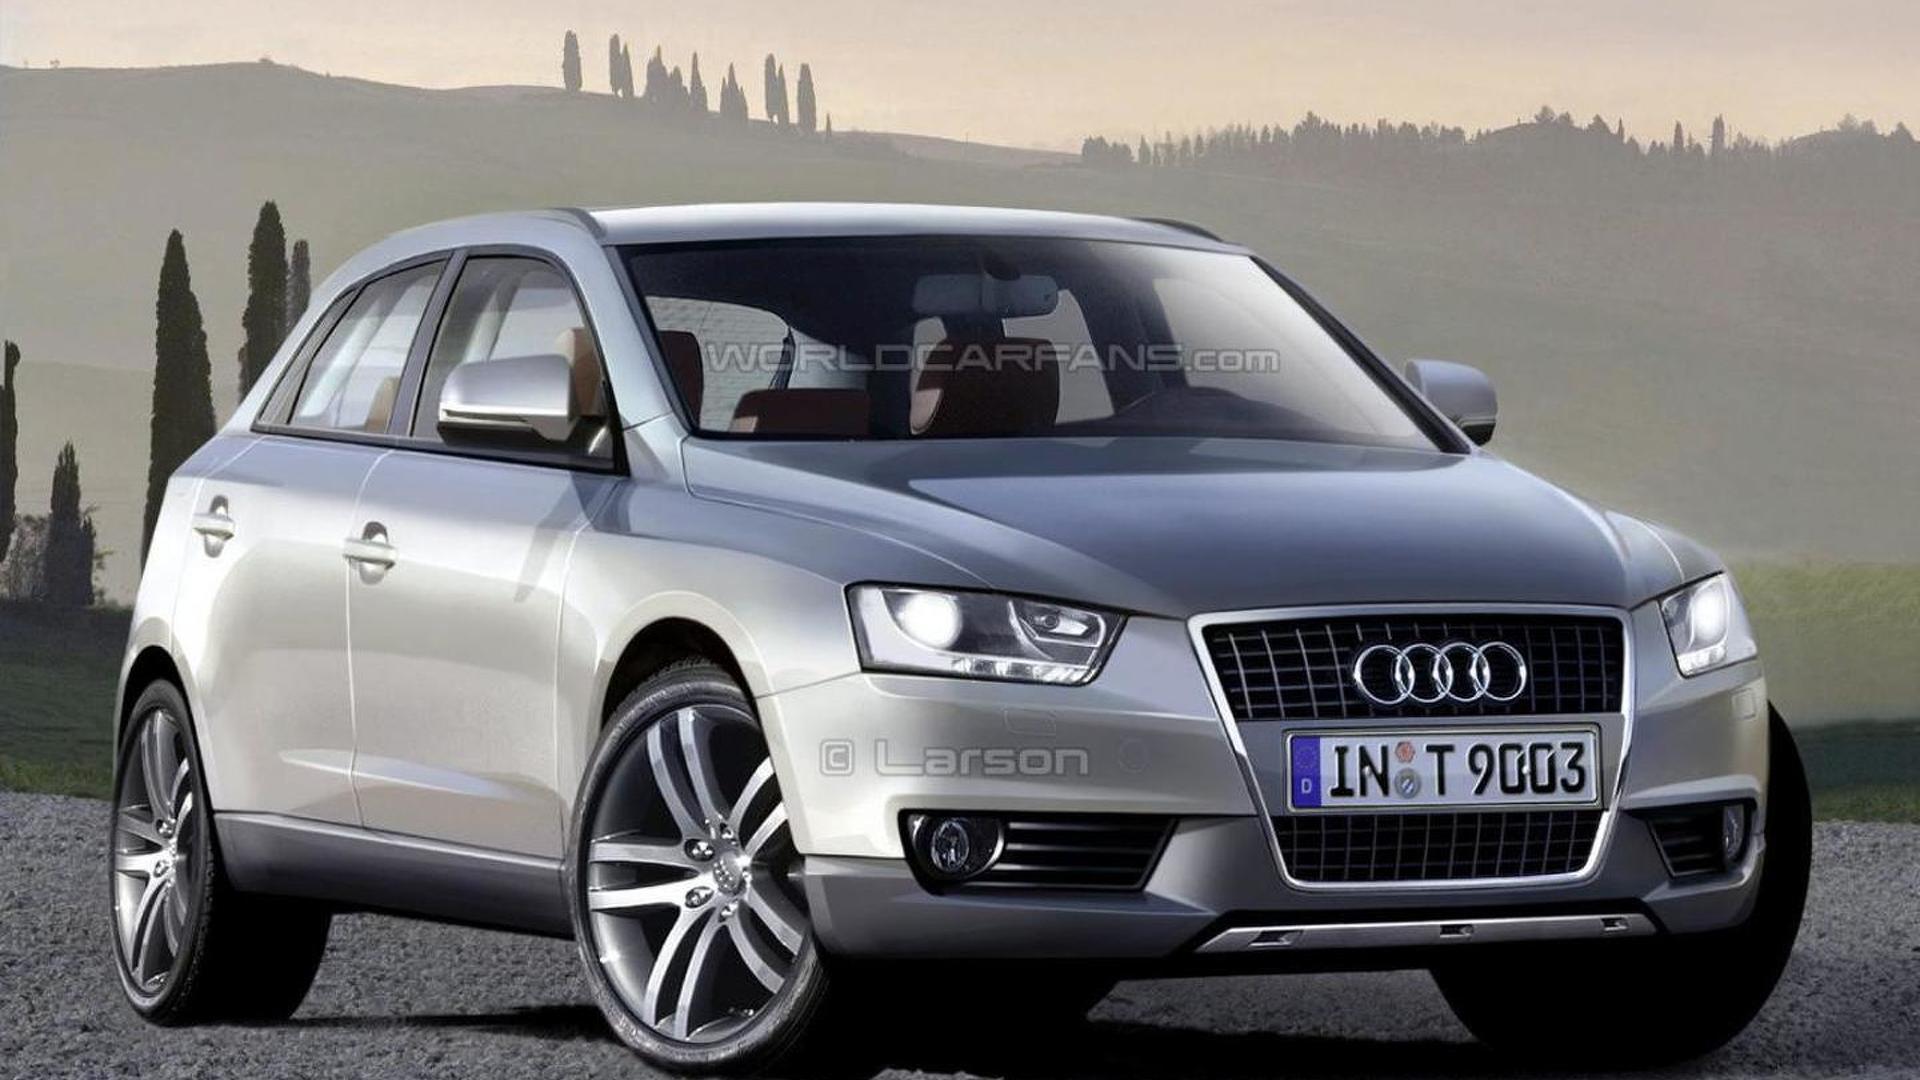 Audi Q SUV In The Cards - Larson audi